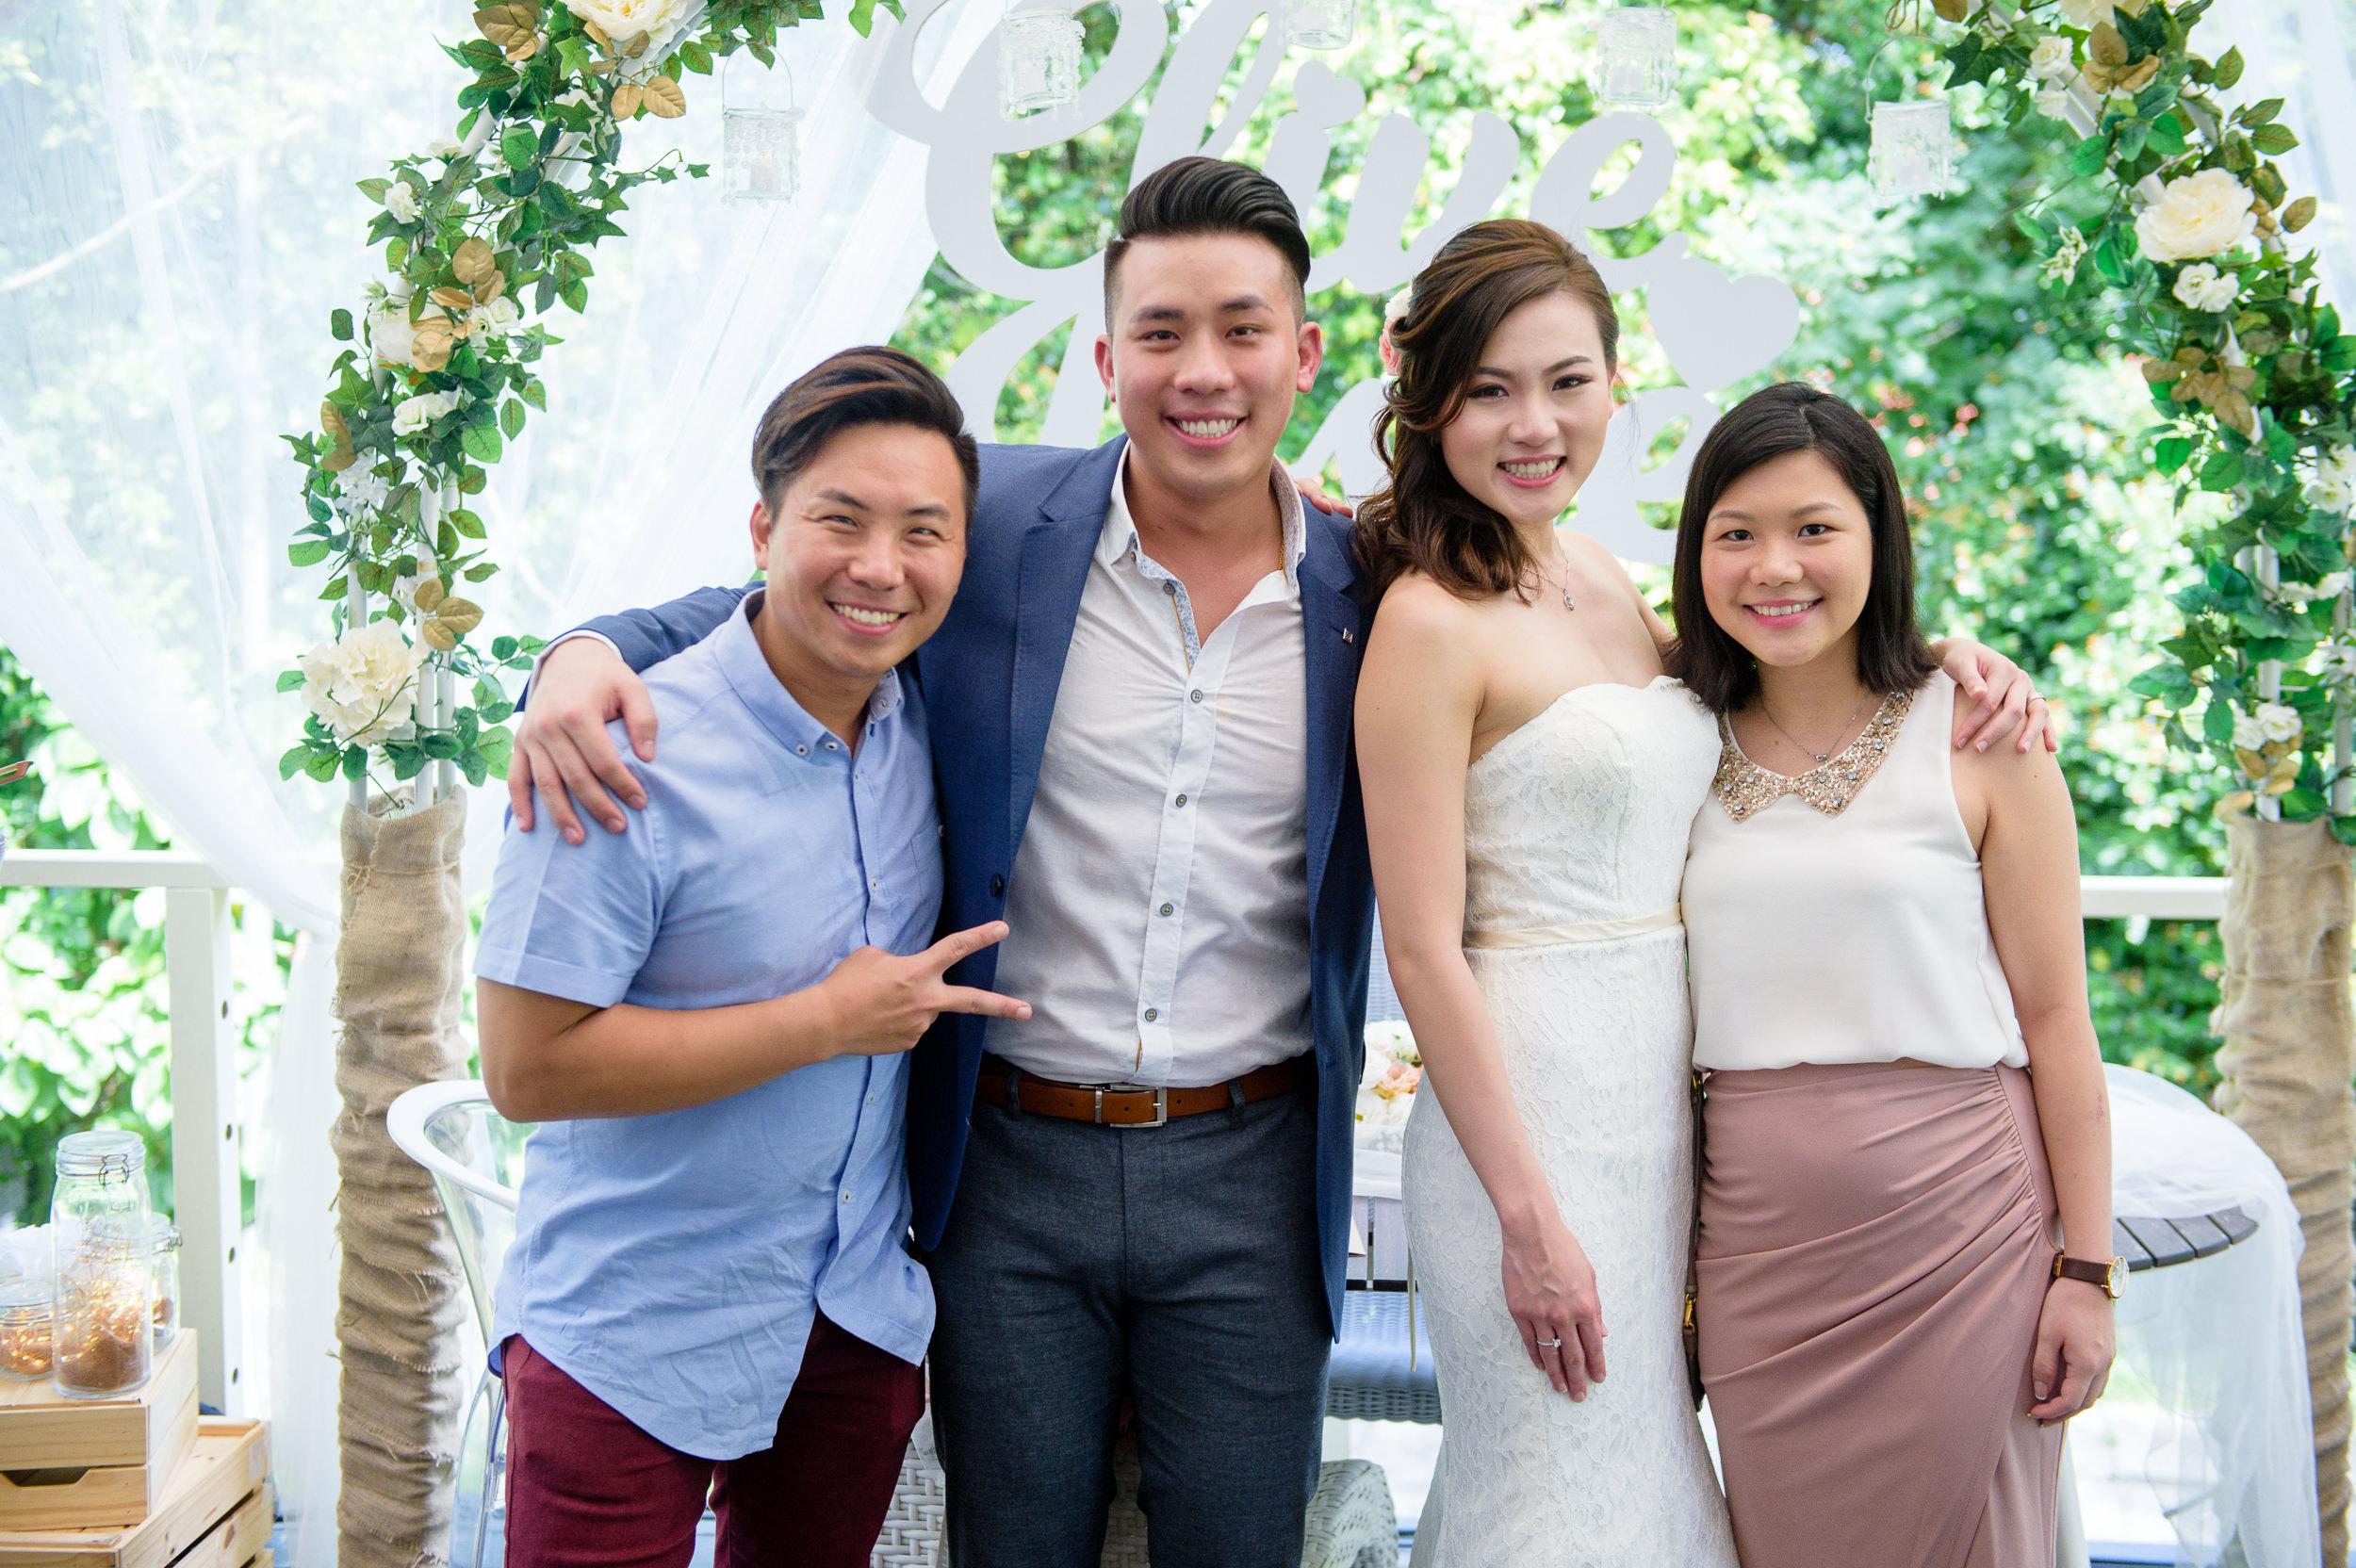 ROM wedding group photo